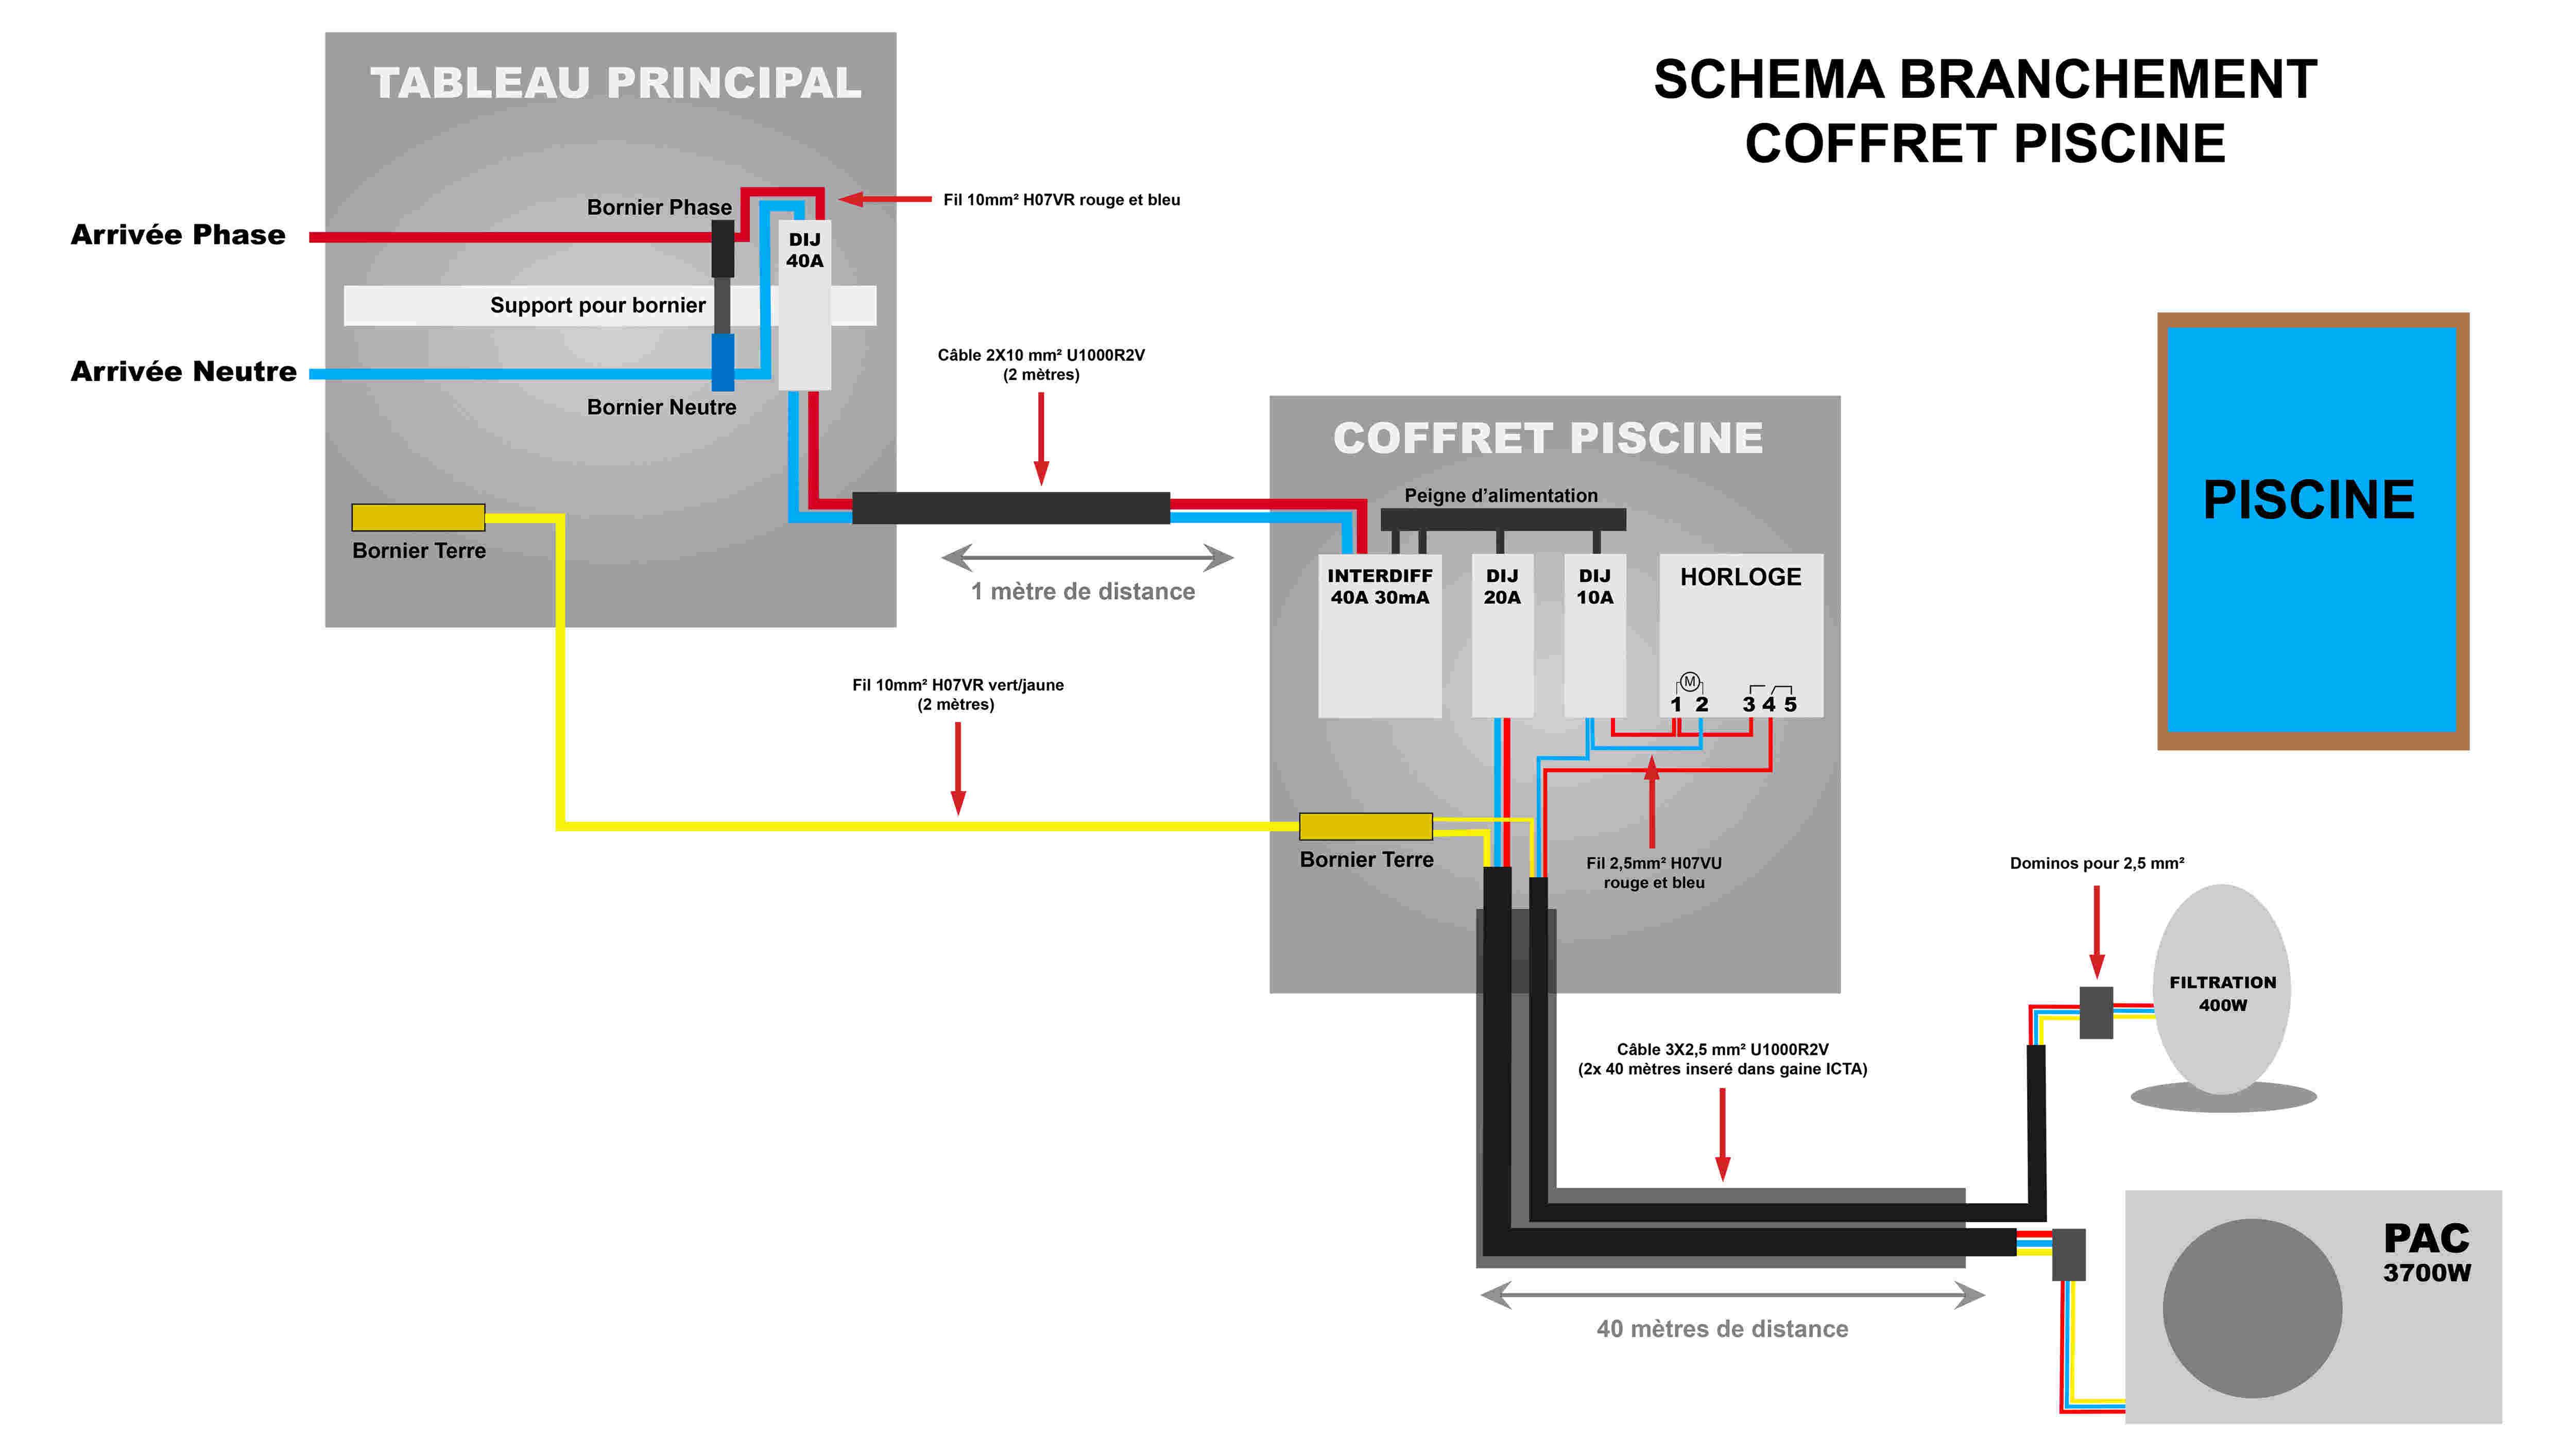 Branchement horloge et fonctionnement Schema14